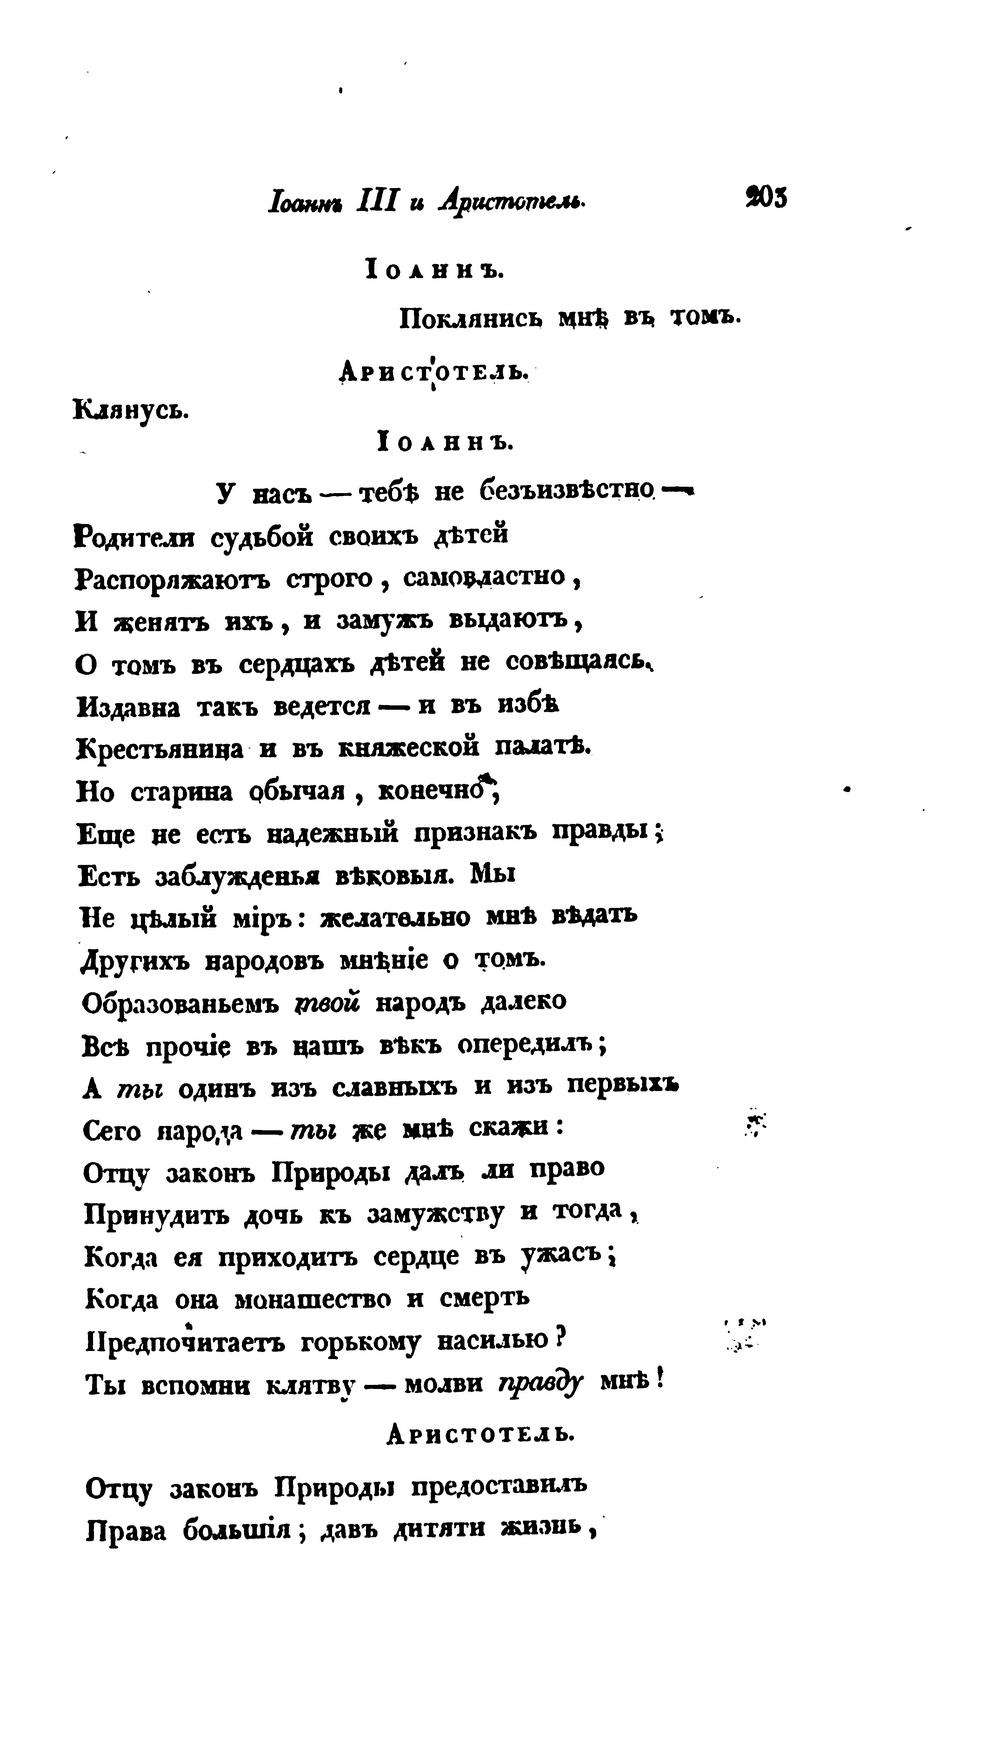 http://i2.imageban.ru/out/2014/01/16/6a5186af81cc0e49031ac50f061b1971.jpg